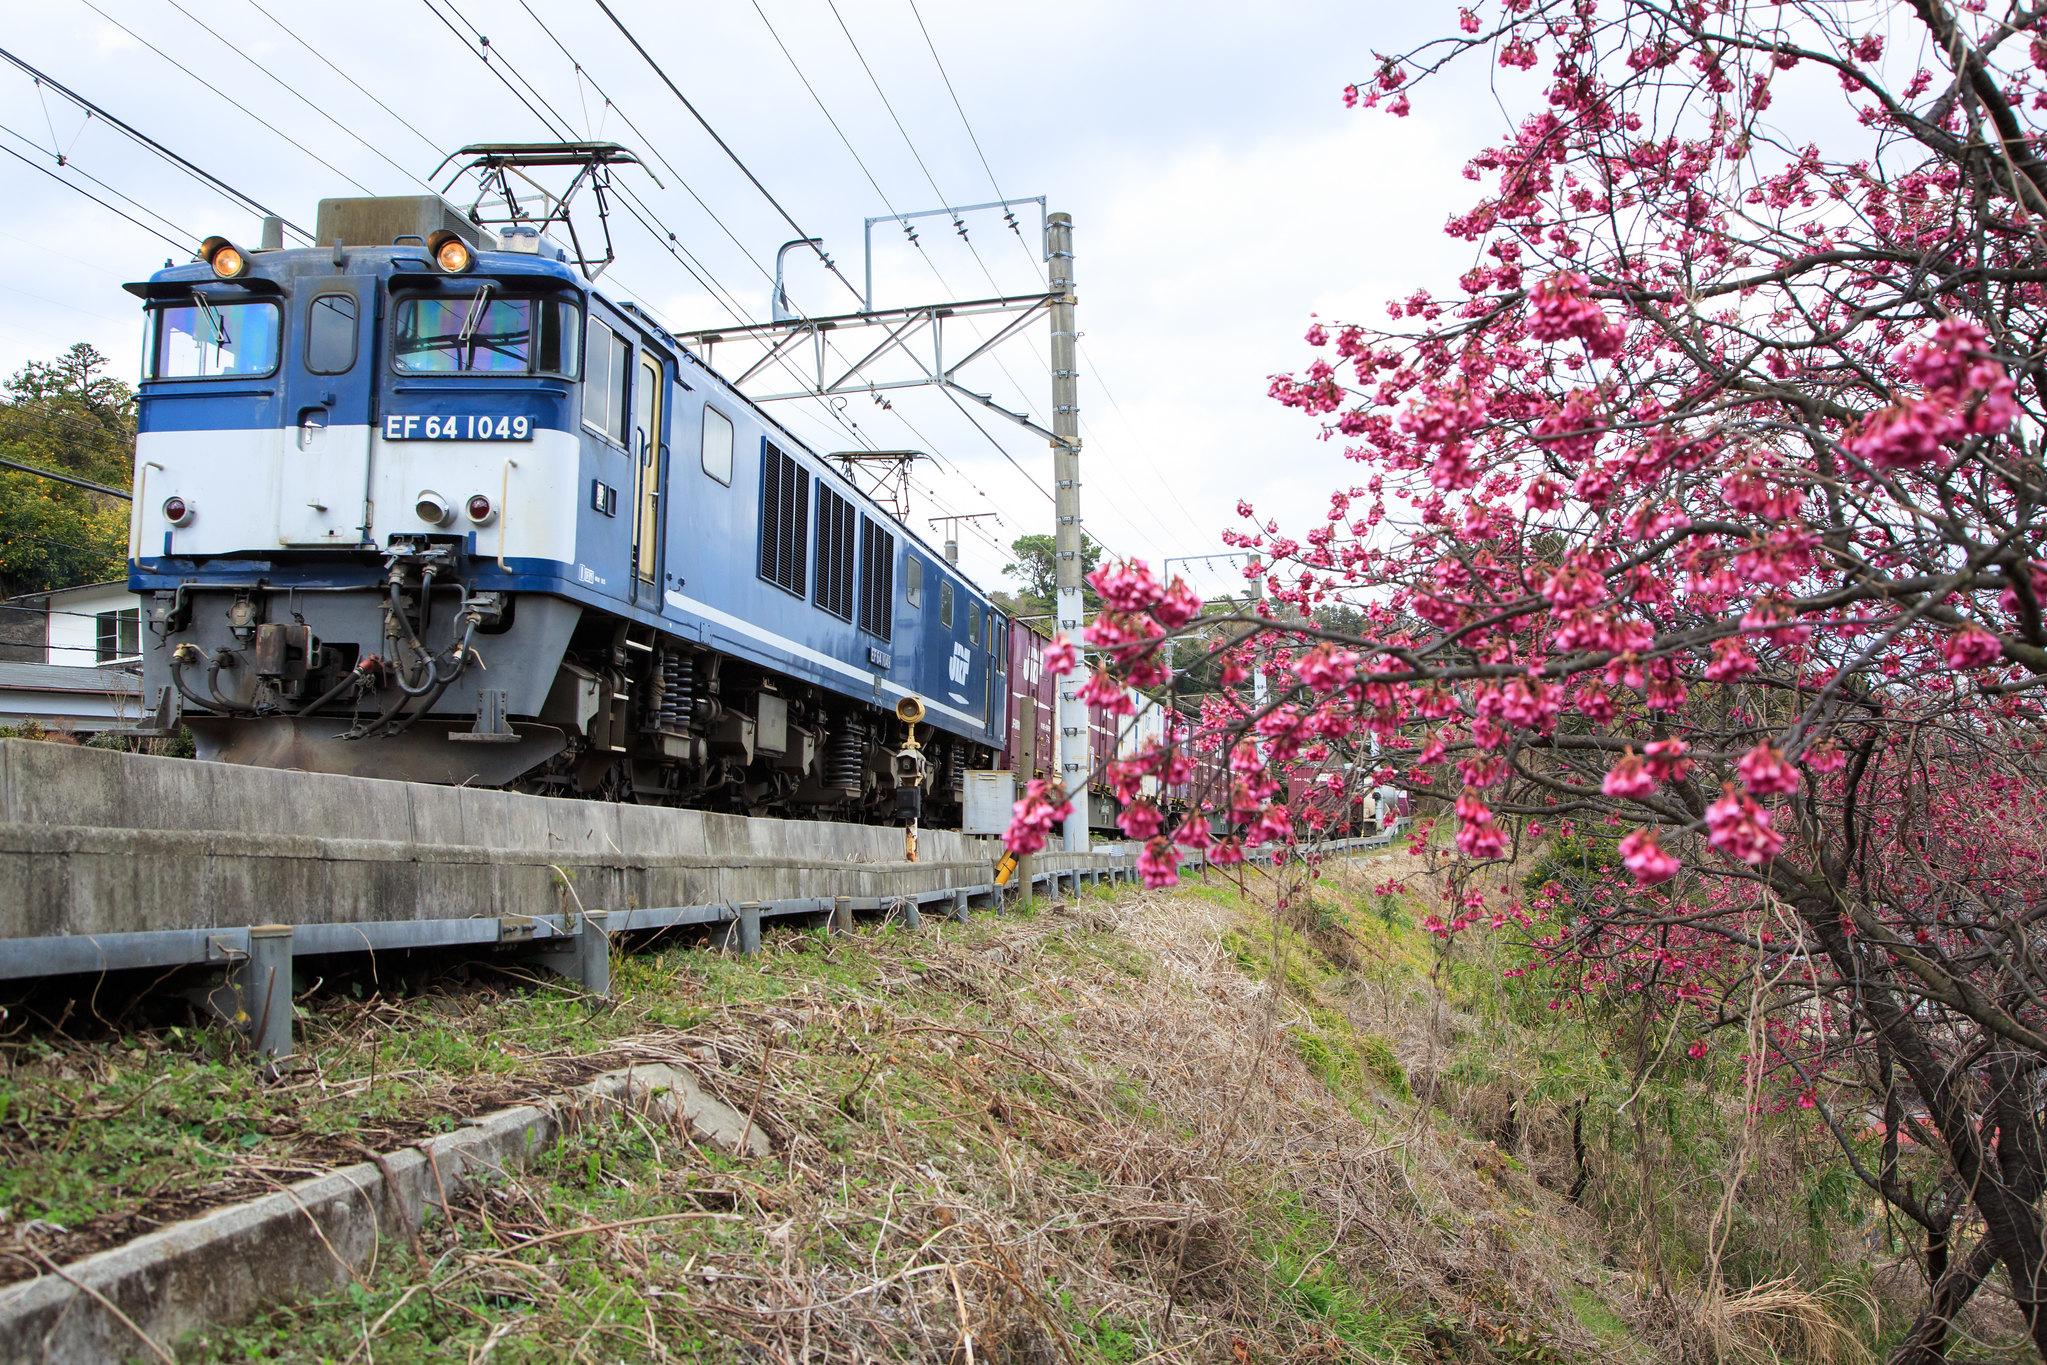 EF64 1049 / Tokaido Line